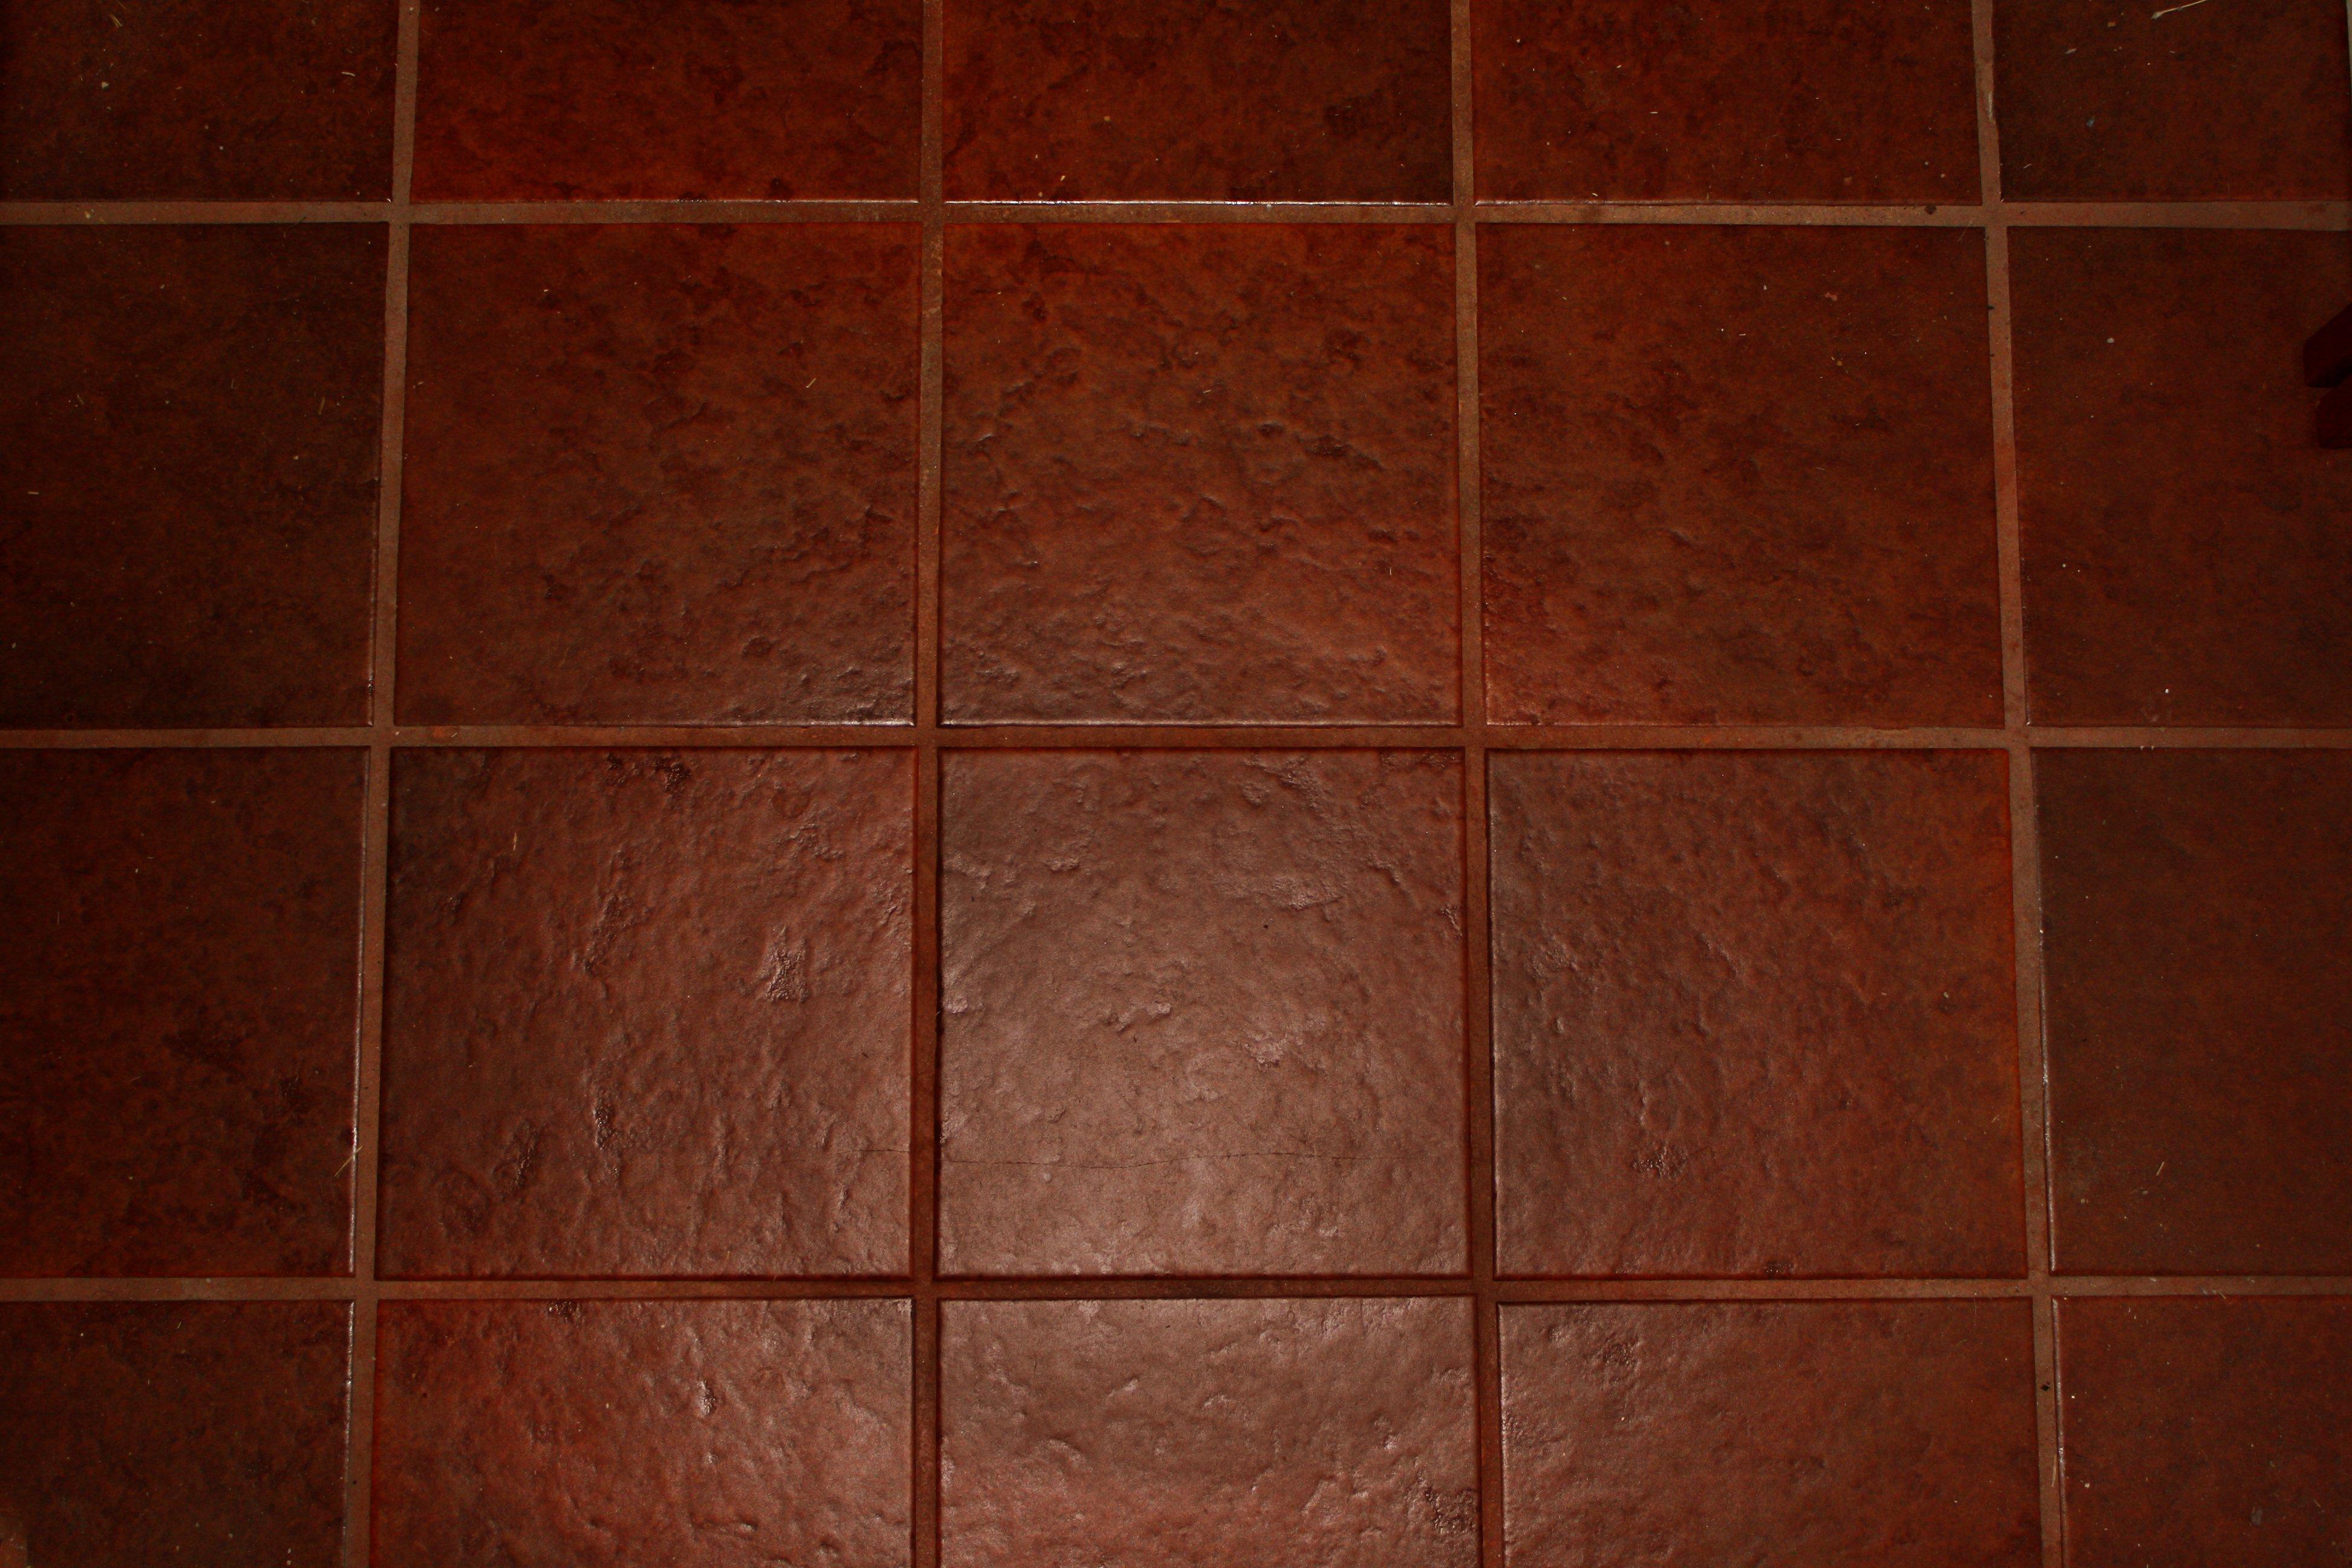 Flooring over tile in the bathroom